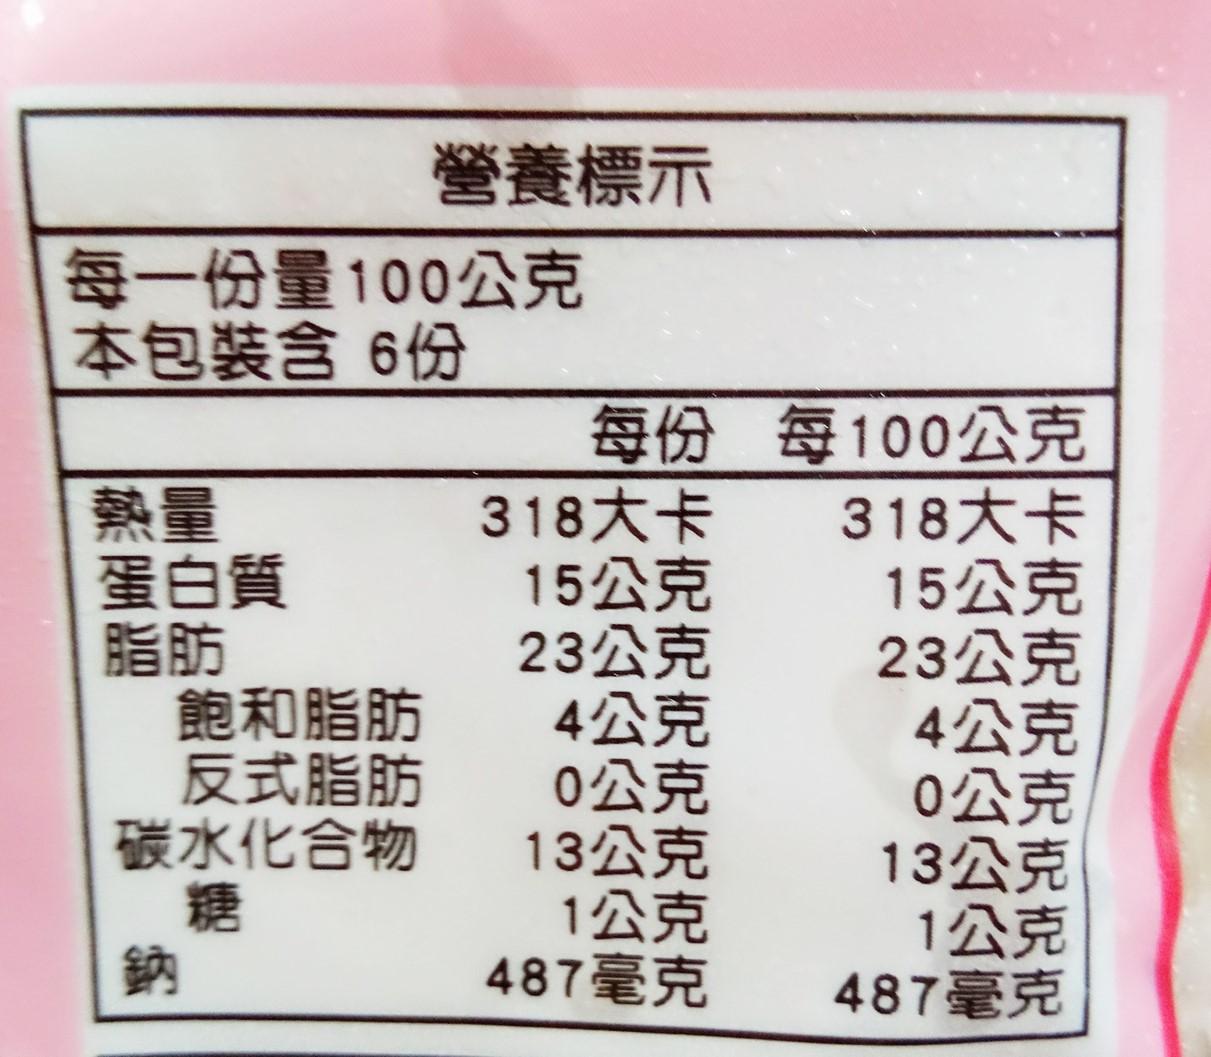 Image R/Salted Chicken 桔缘香-盐酥鸡 600grams